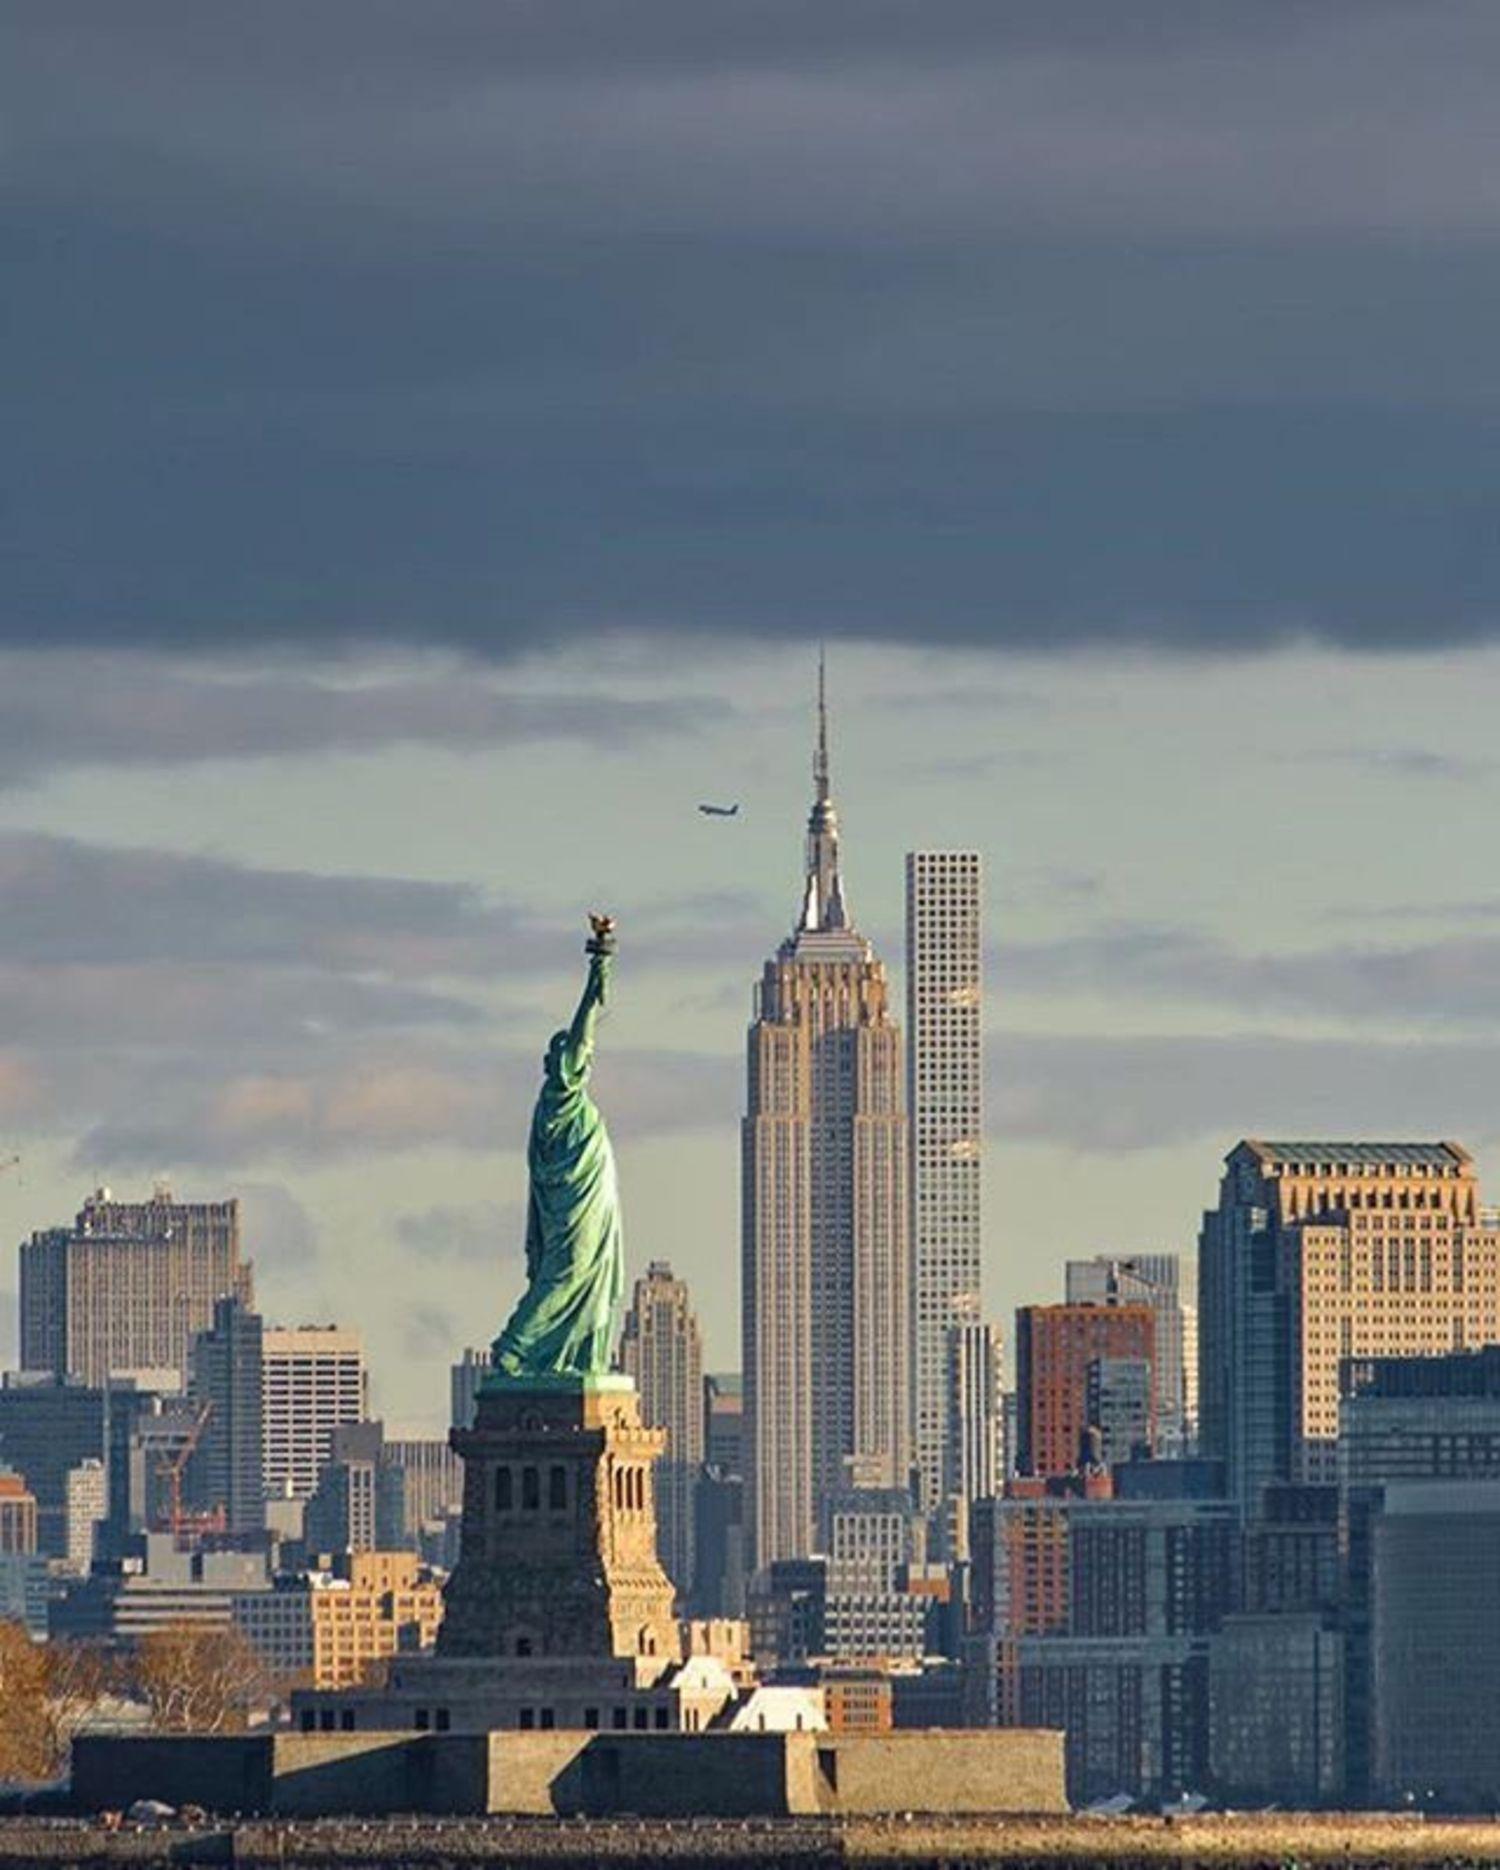 Statue of Liberty, New York, New York. Photo via @eyecatchingphoto #viewingnyc #newyorkcity #newyork #nyc